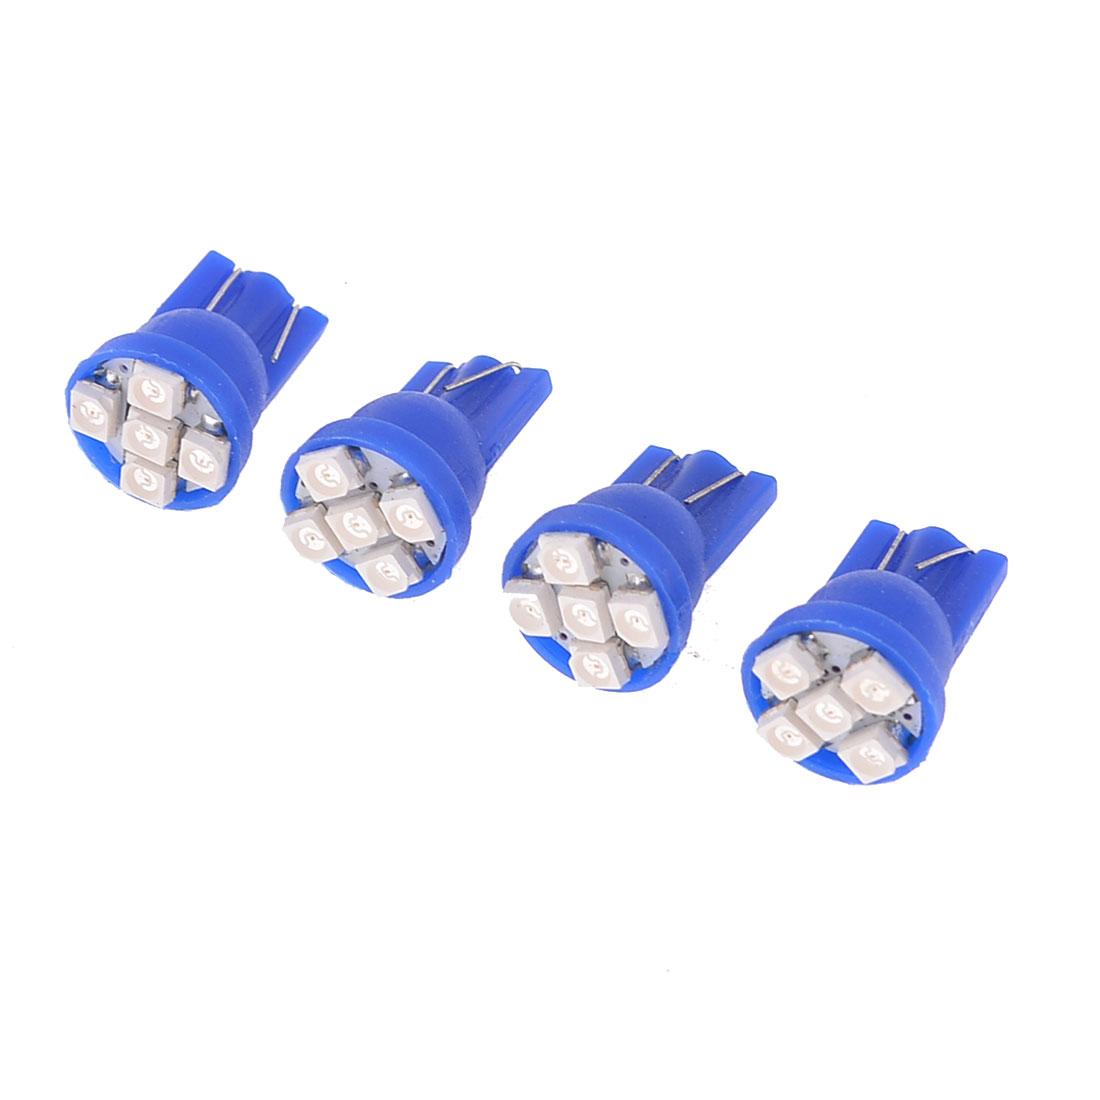 4 x T10 194 152 Wedge Blue 1210 3528 SMD 5-LED Car Dashboard Light Lamp Bulb